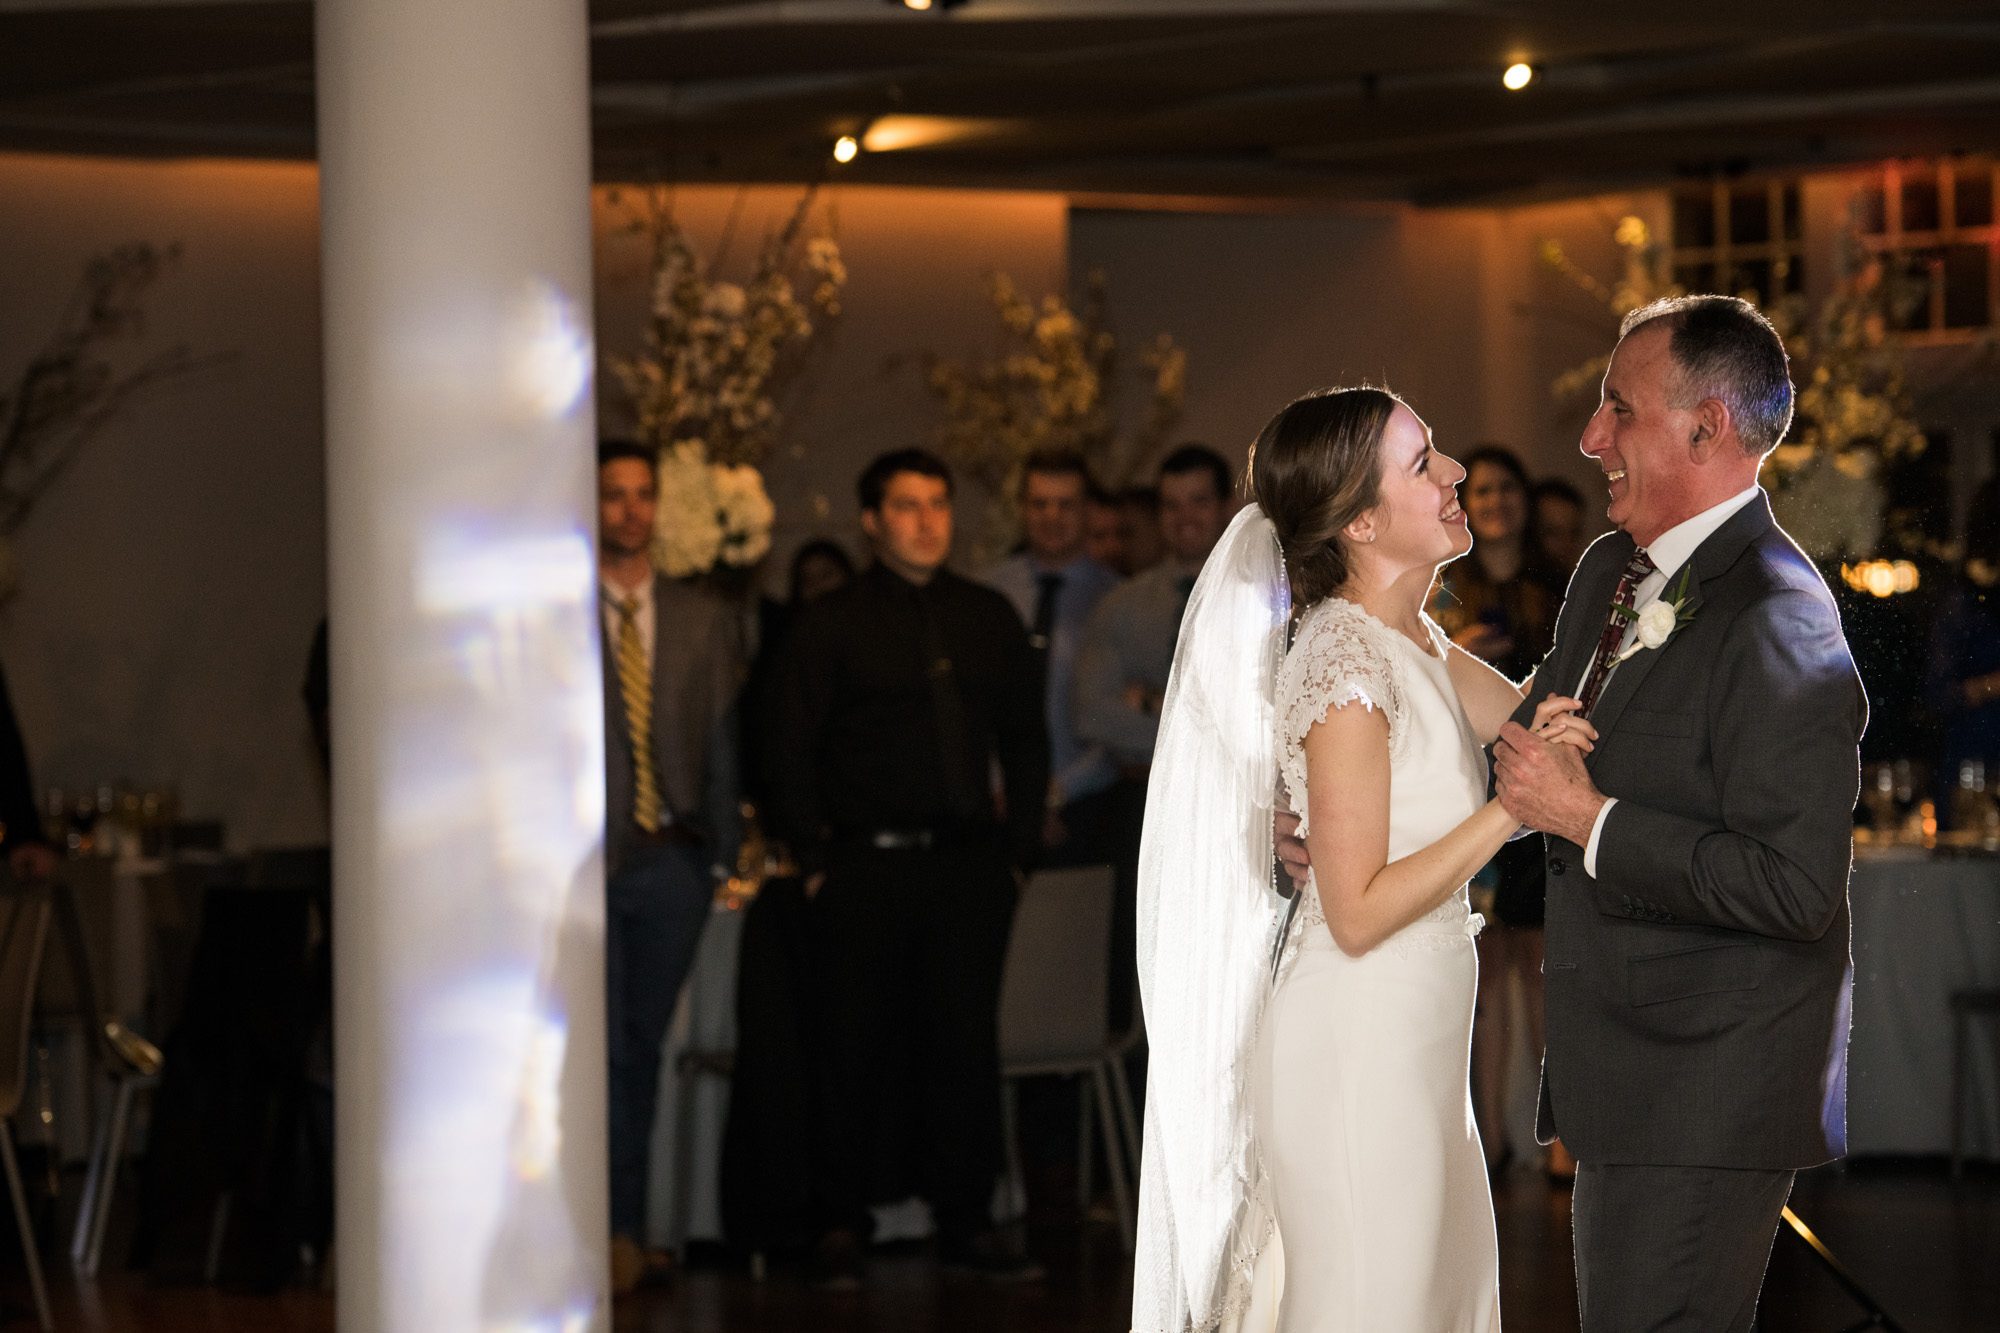 nj-wedding-photographer-maritime-parc-maria-david-47.jpg